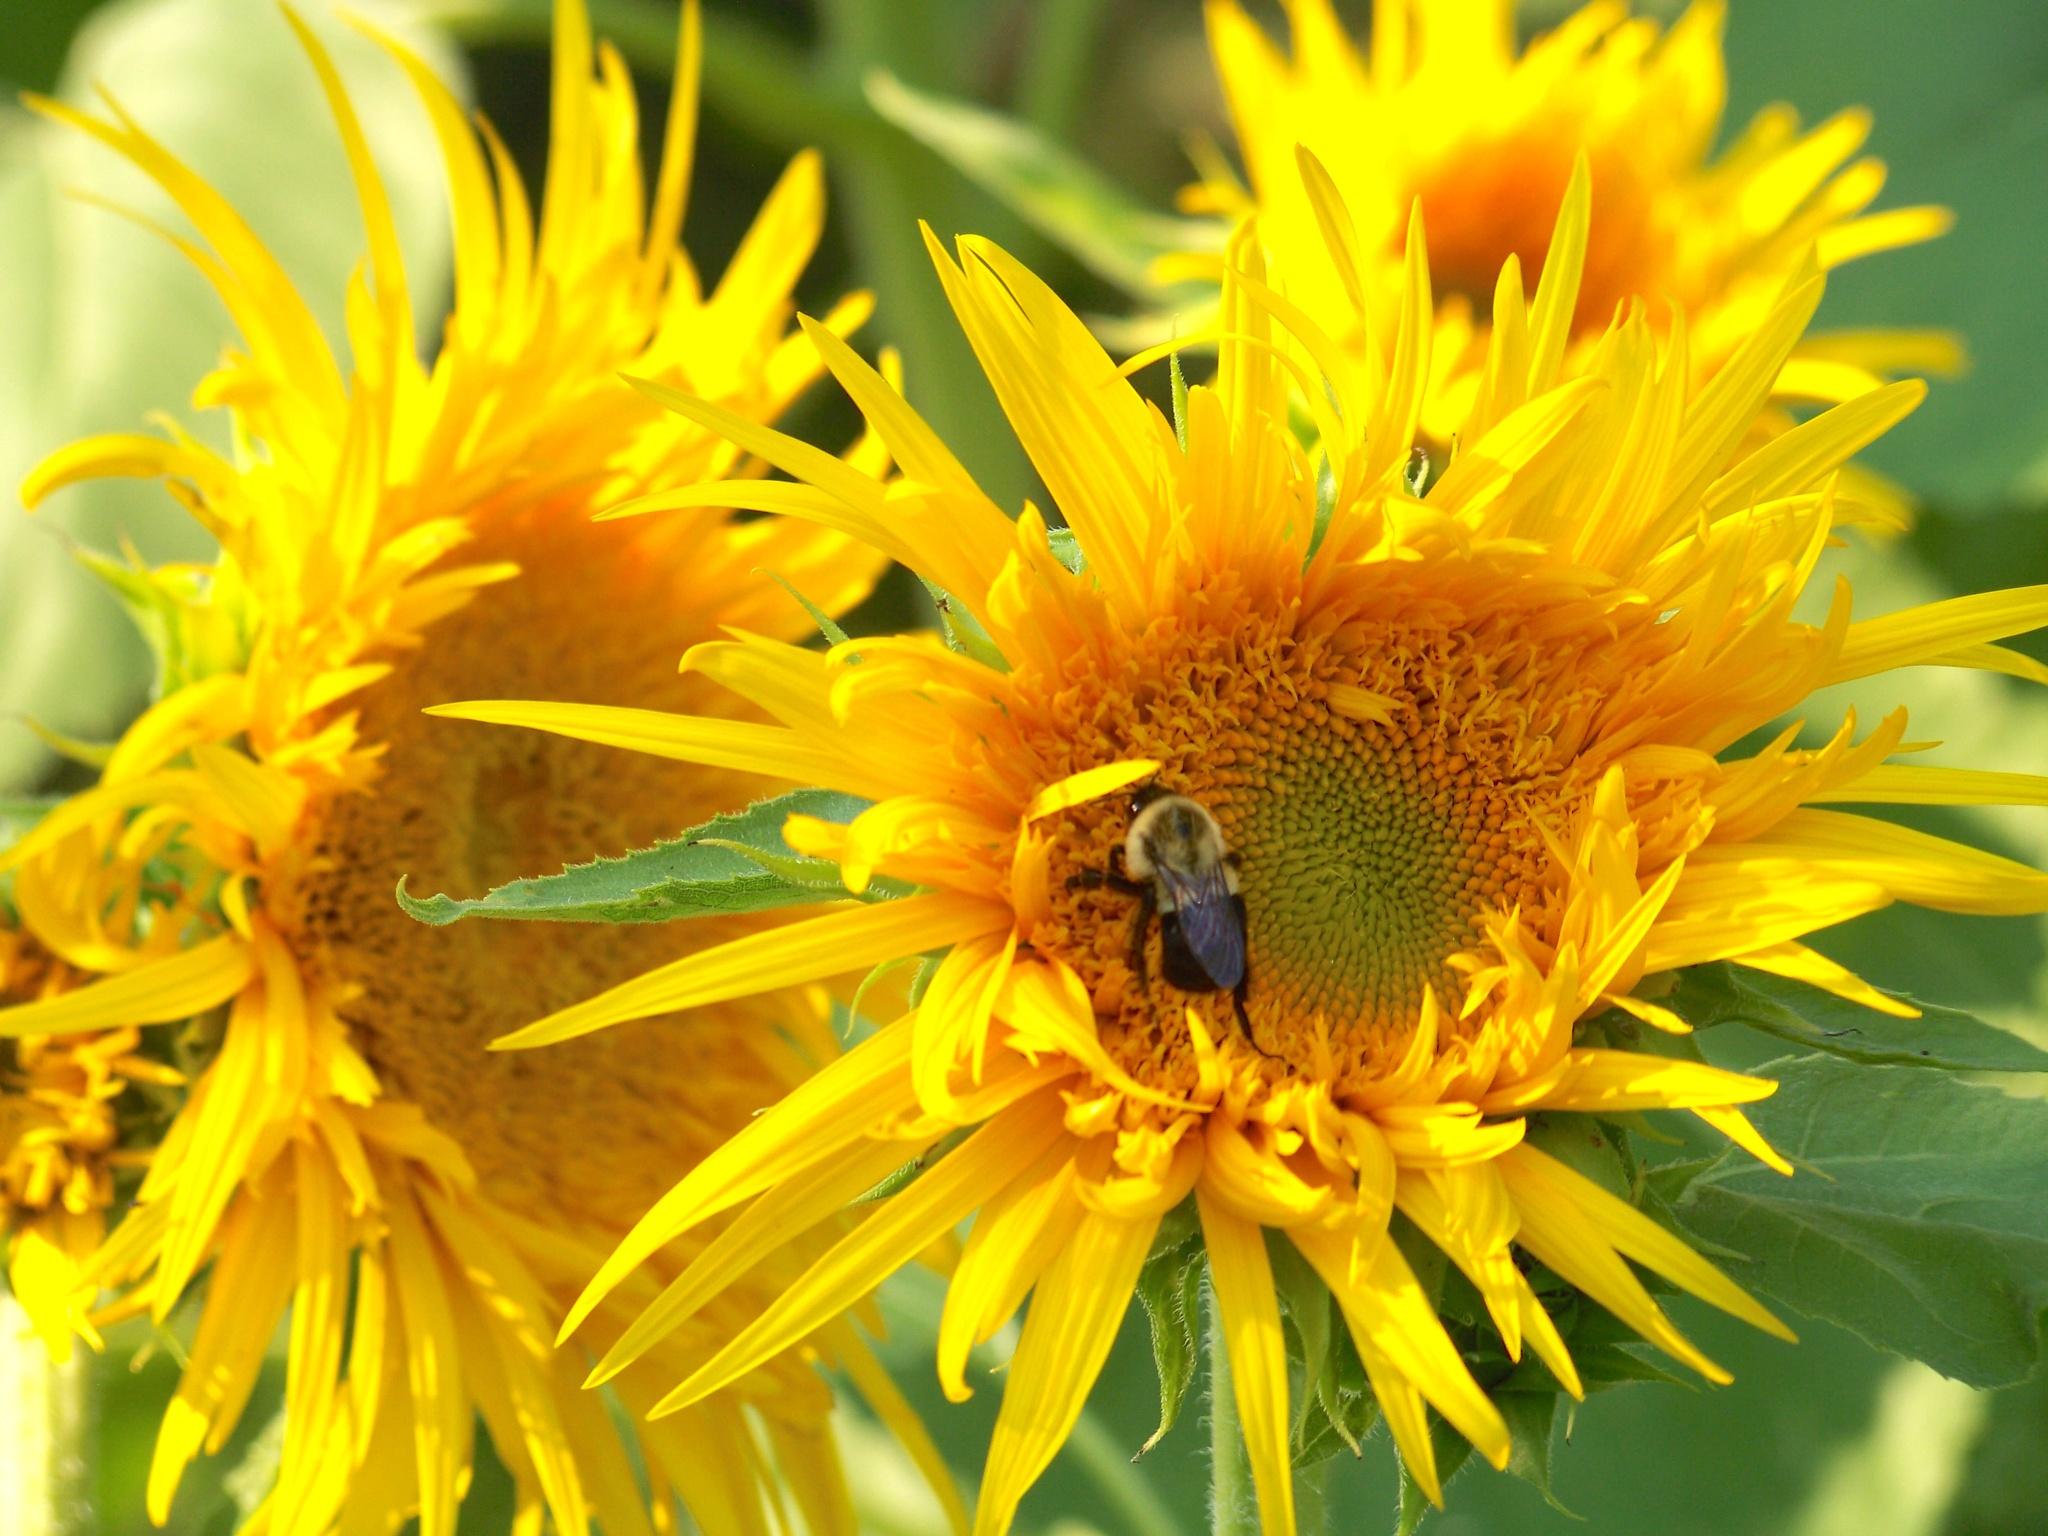 Spidery Sunflowers by suzanne.kohr